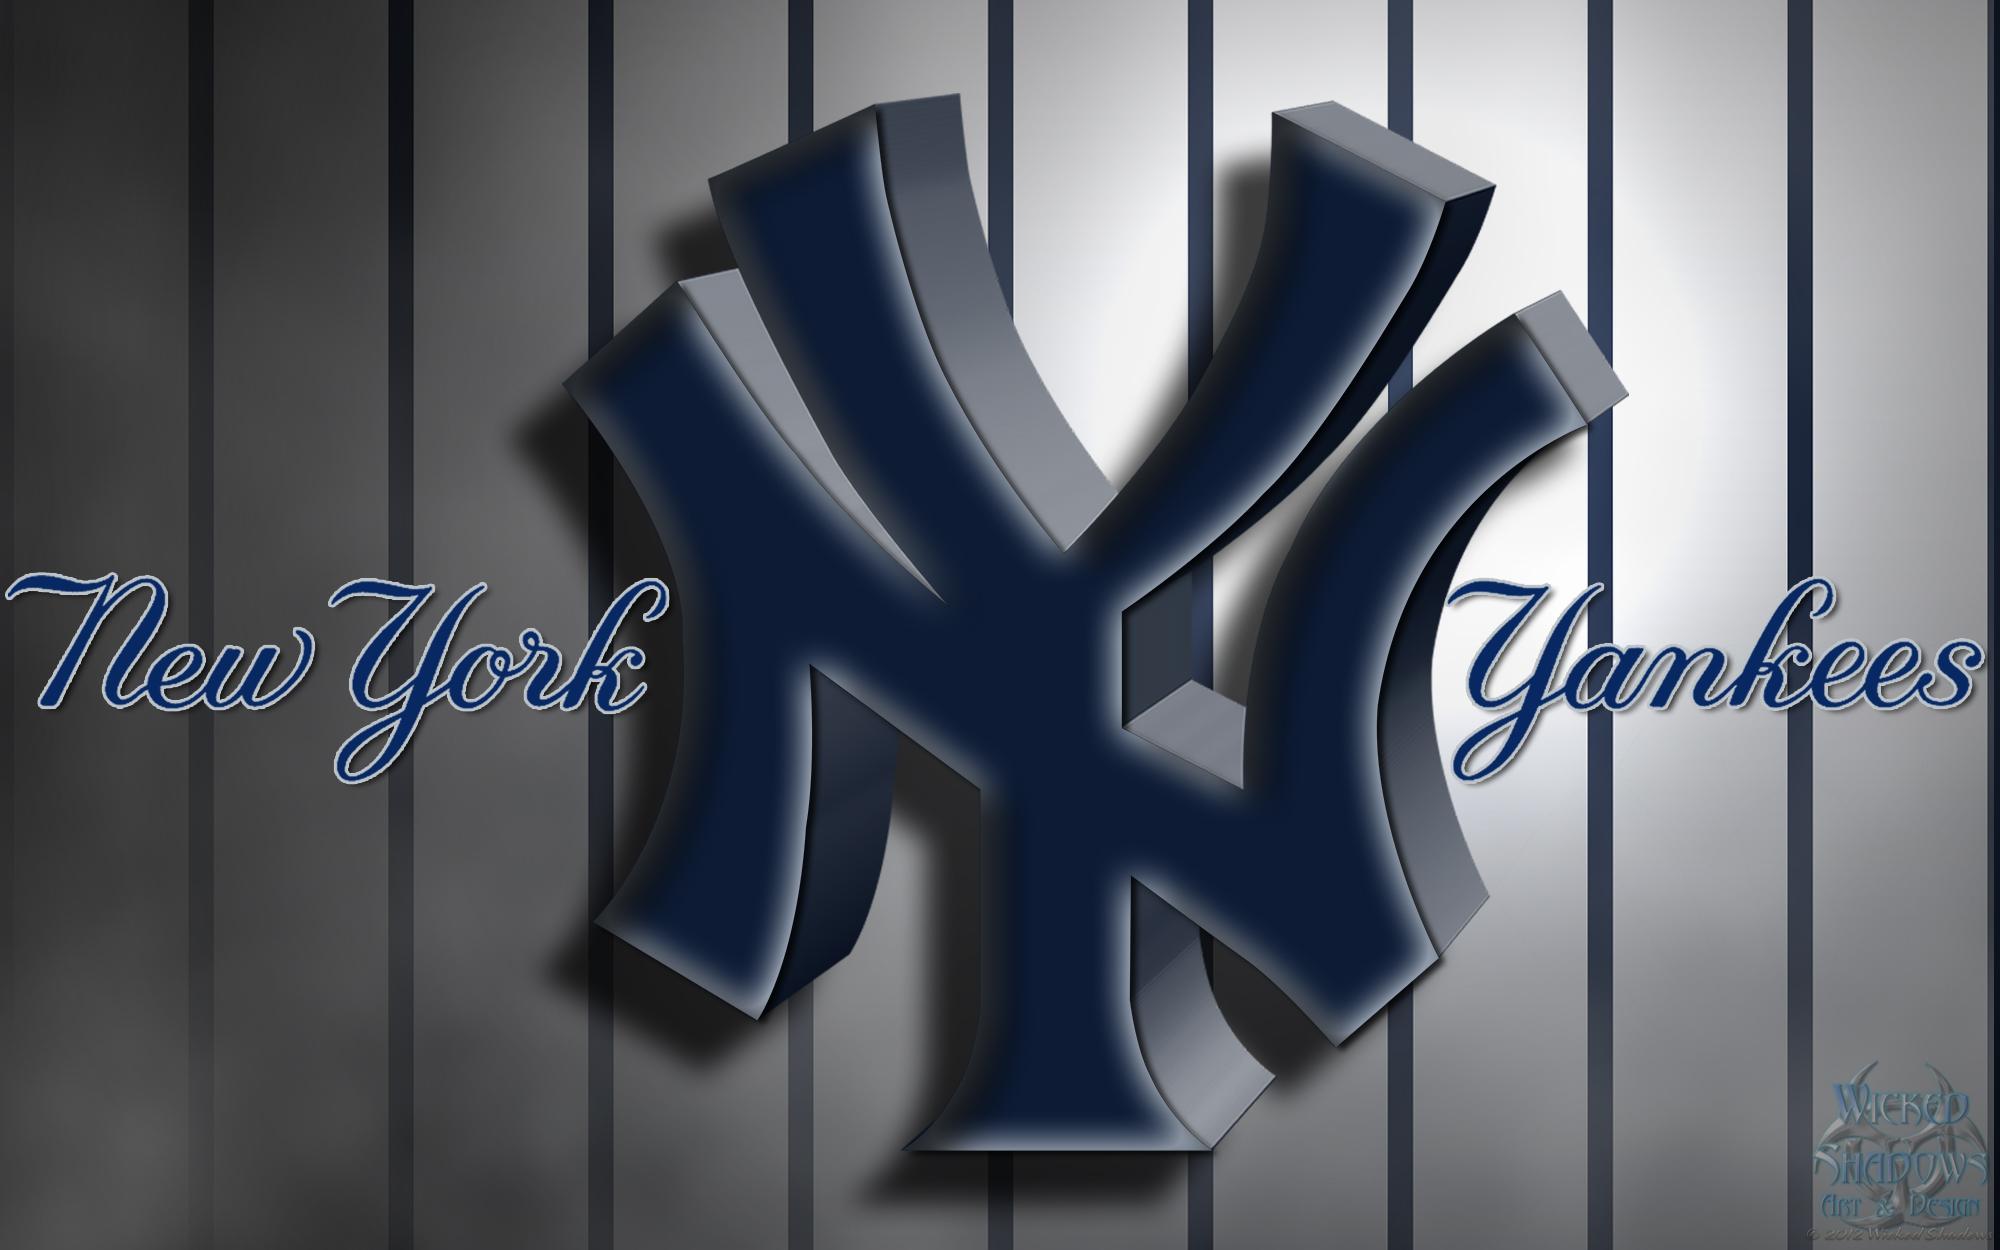 New York Yankees 3D Logo Wallpaper Download Wallpaper 2000x1250